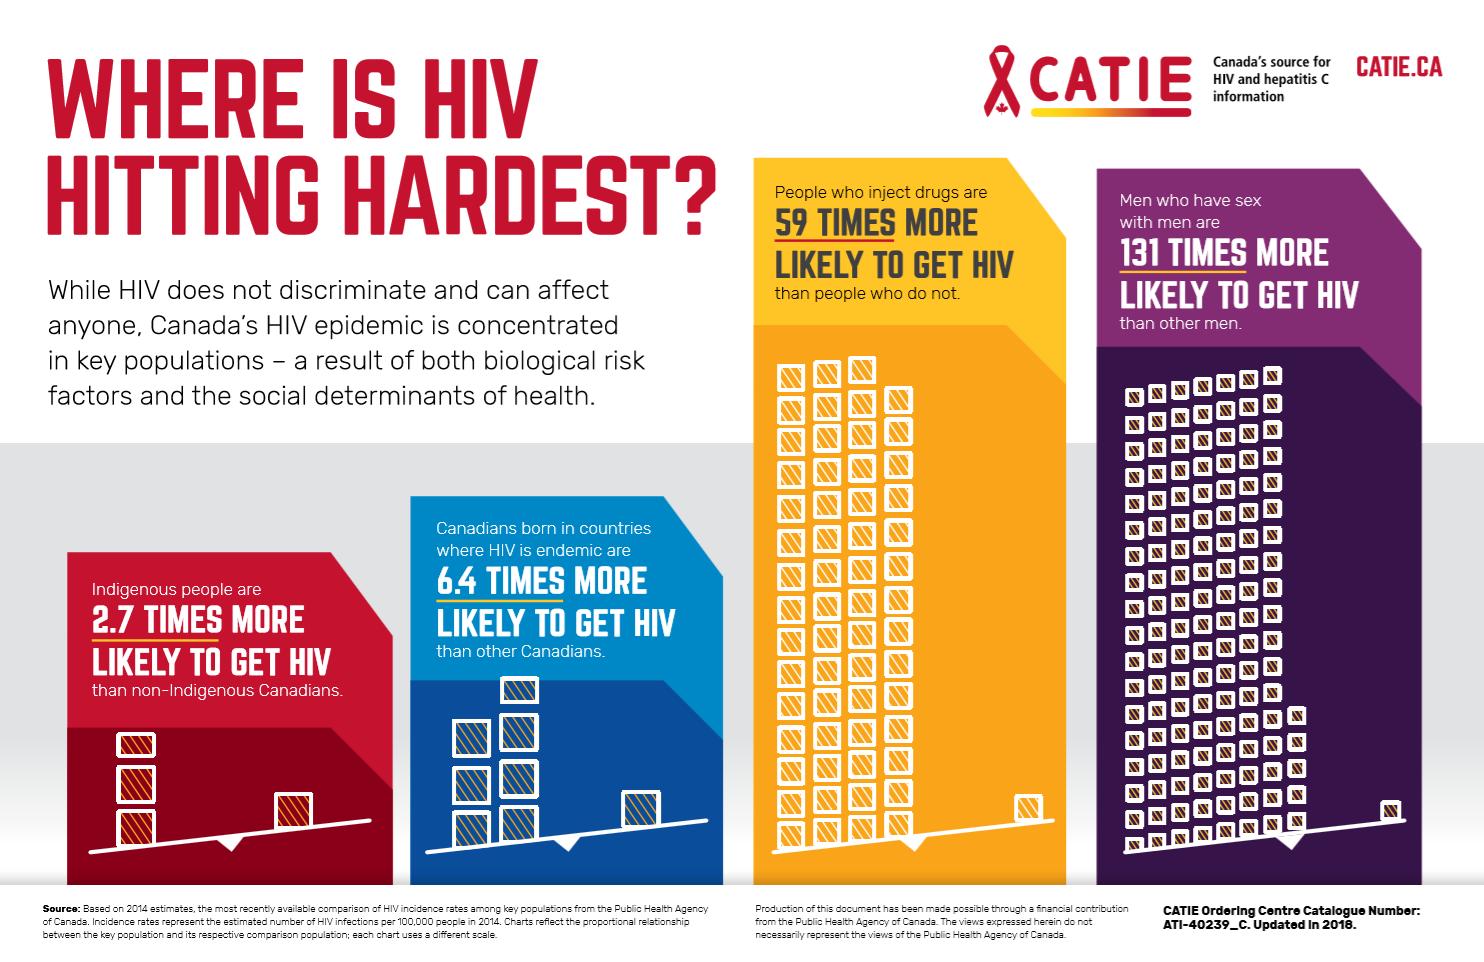 Where is HIV hitting hardest?